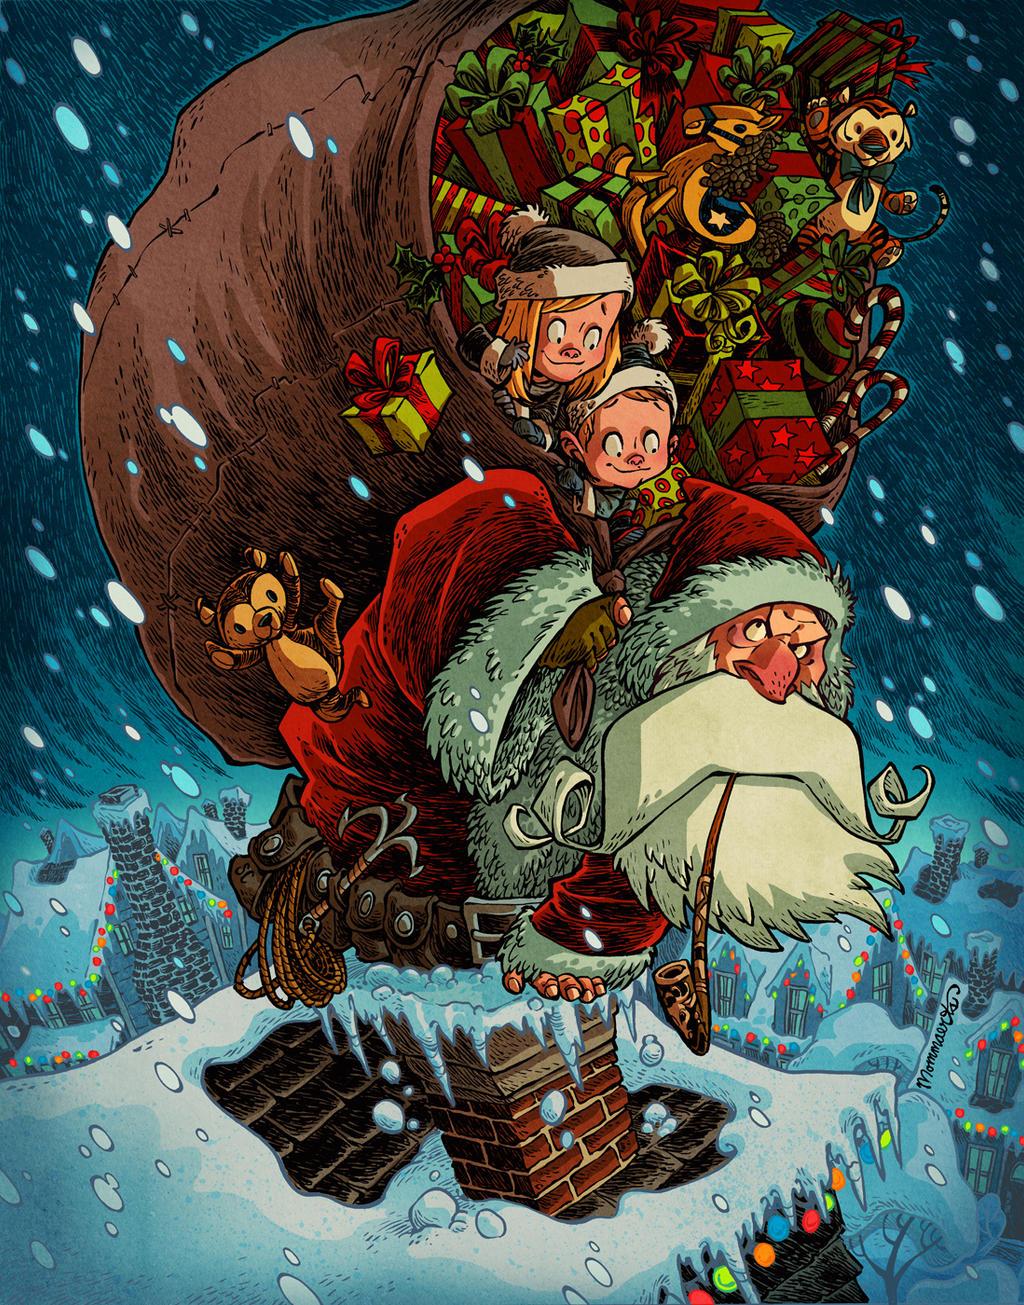 Santa Stowaways by RobbVision